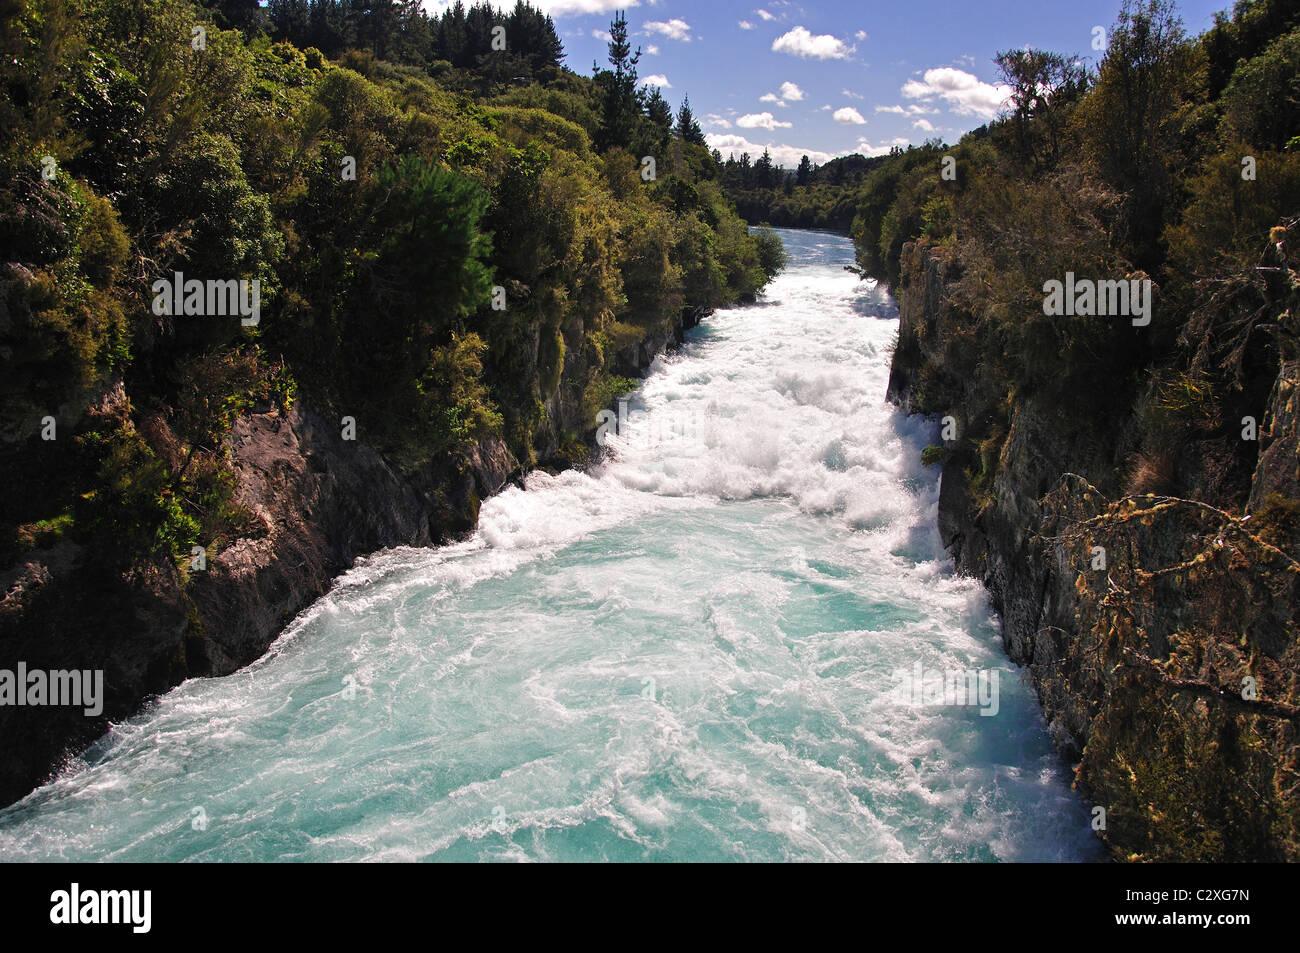 Powerful current of Huka Falls, near Taupo, Waikato Region, North Island, New Zealand - Stock Image